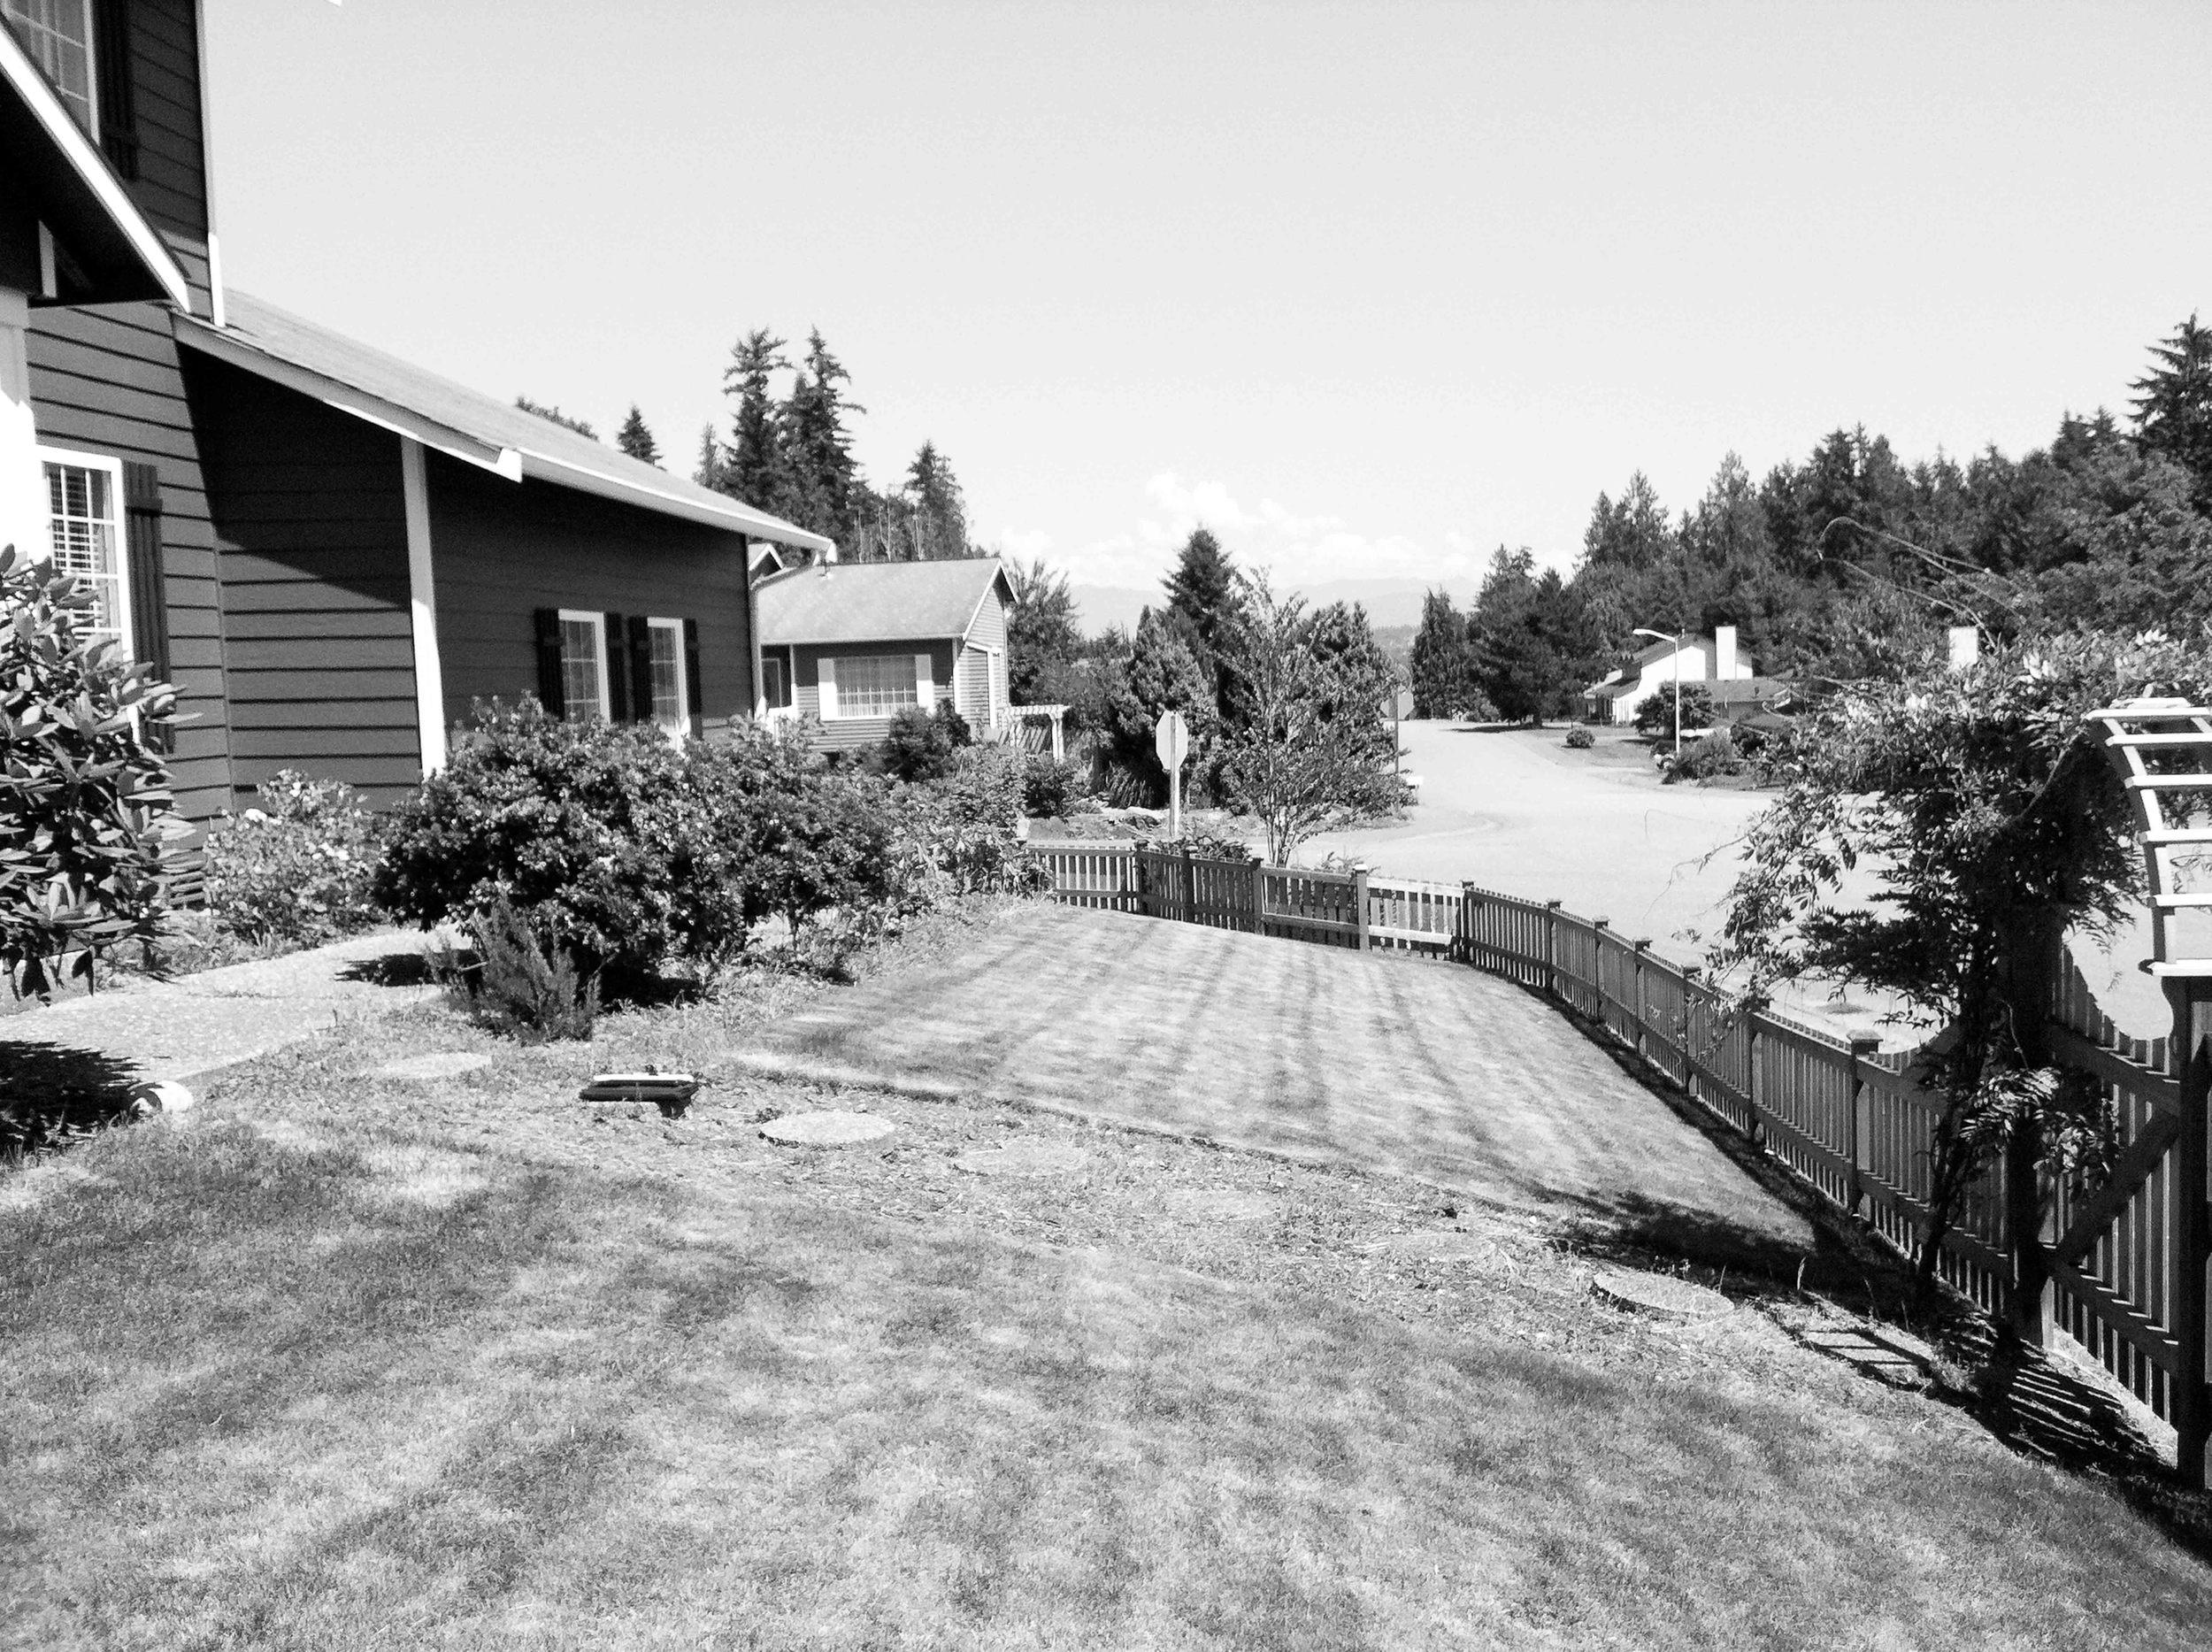 Suburban Front Yard Farm_Seattle Urban Farm Co. Design/Build_before